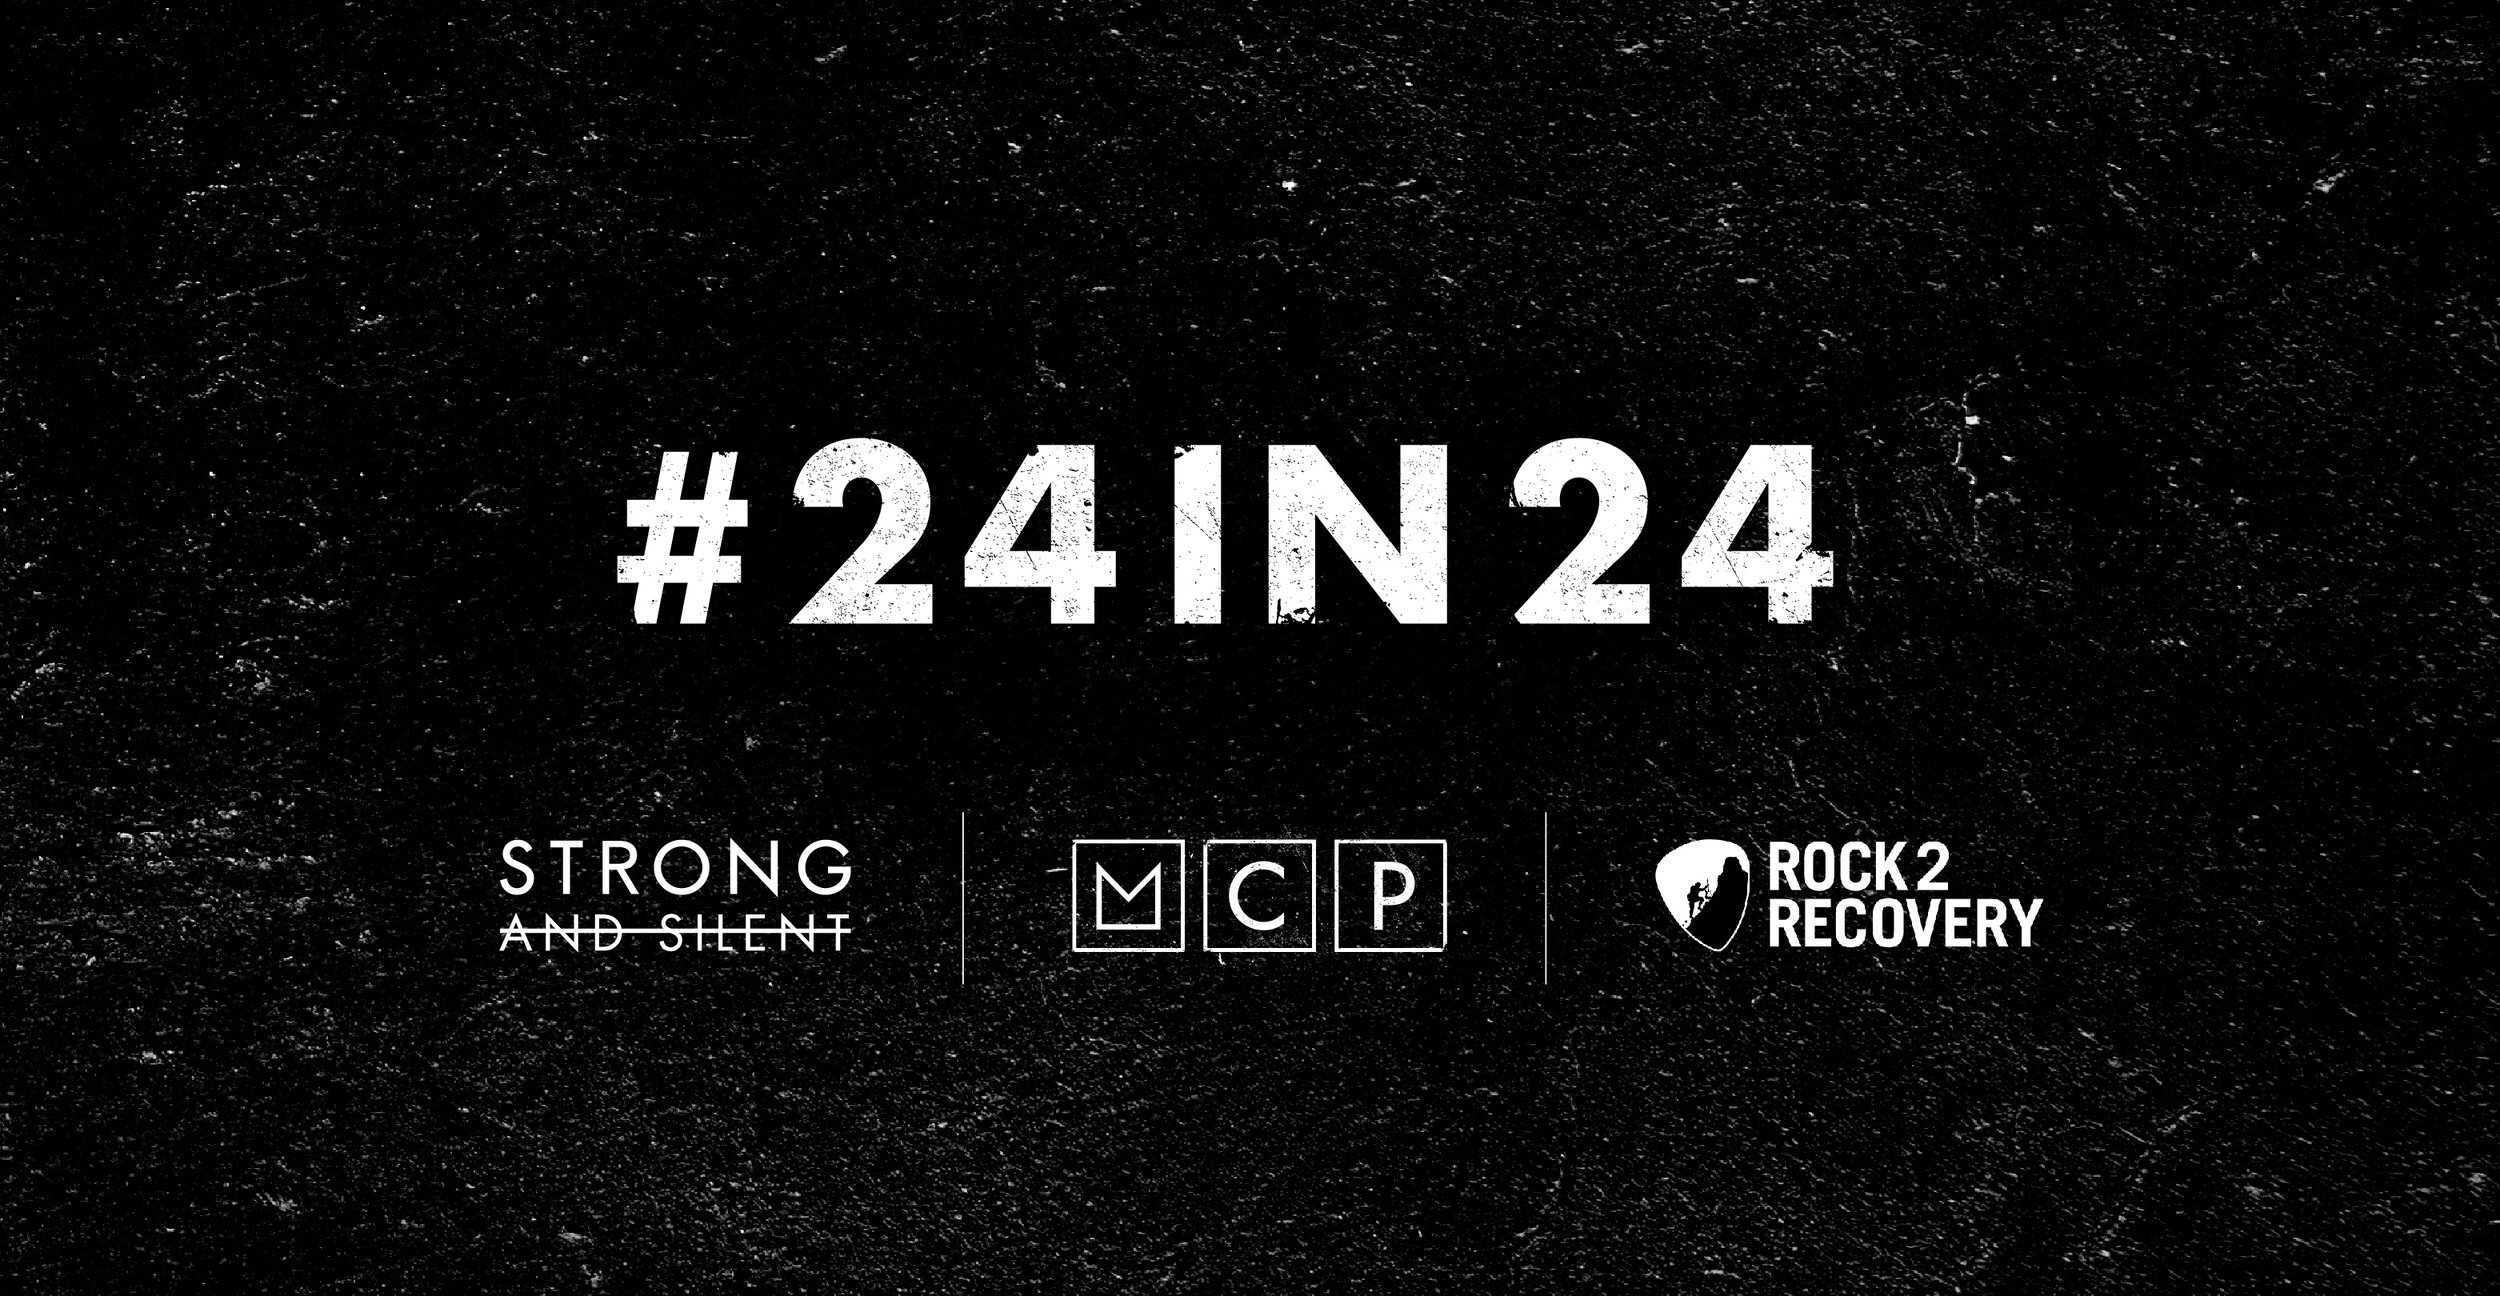 24In24